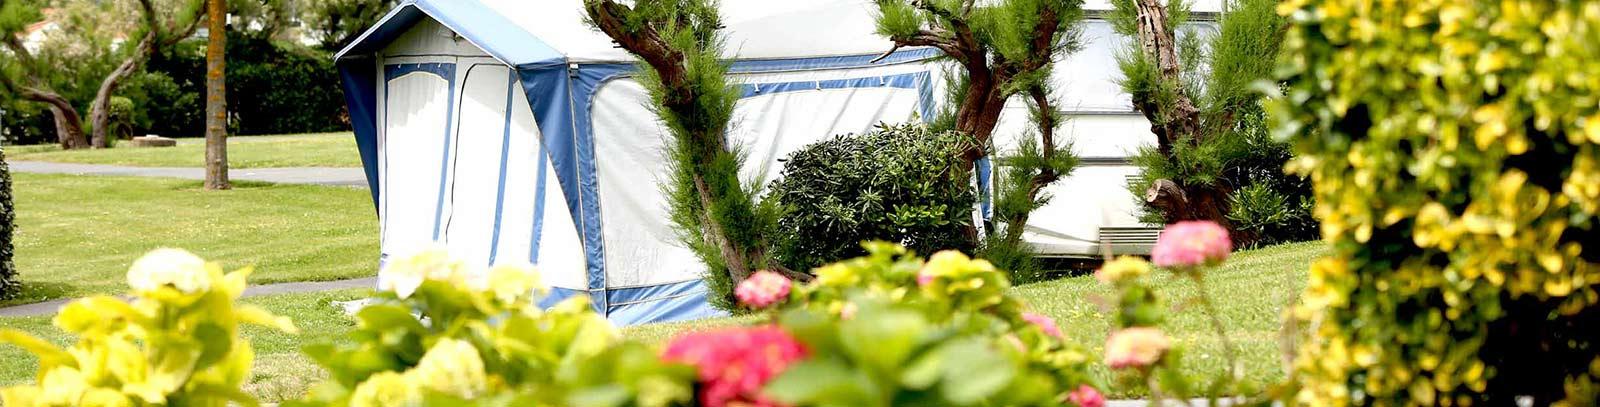 Camping avec espace vert pays basque